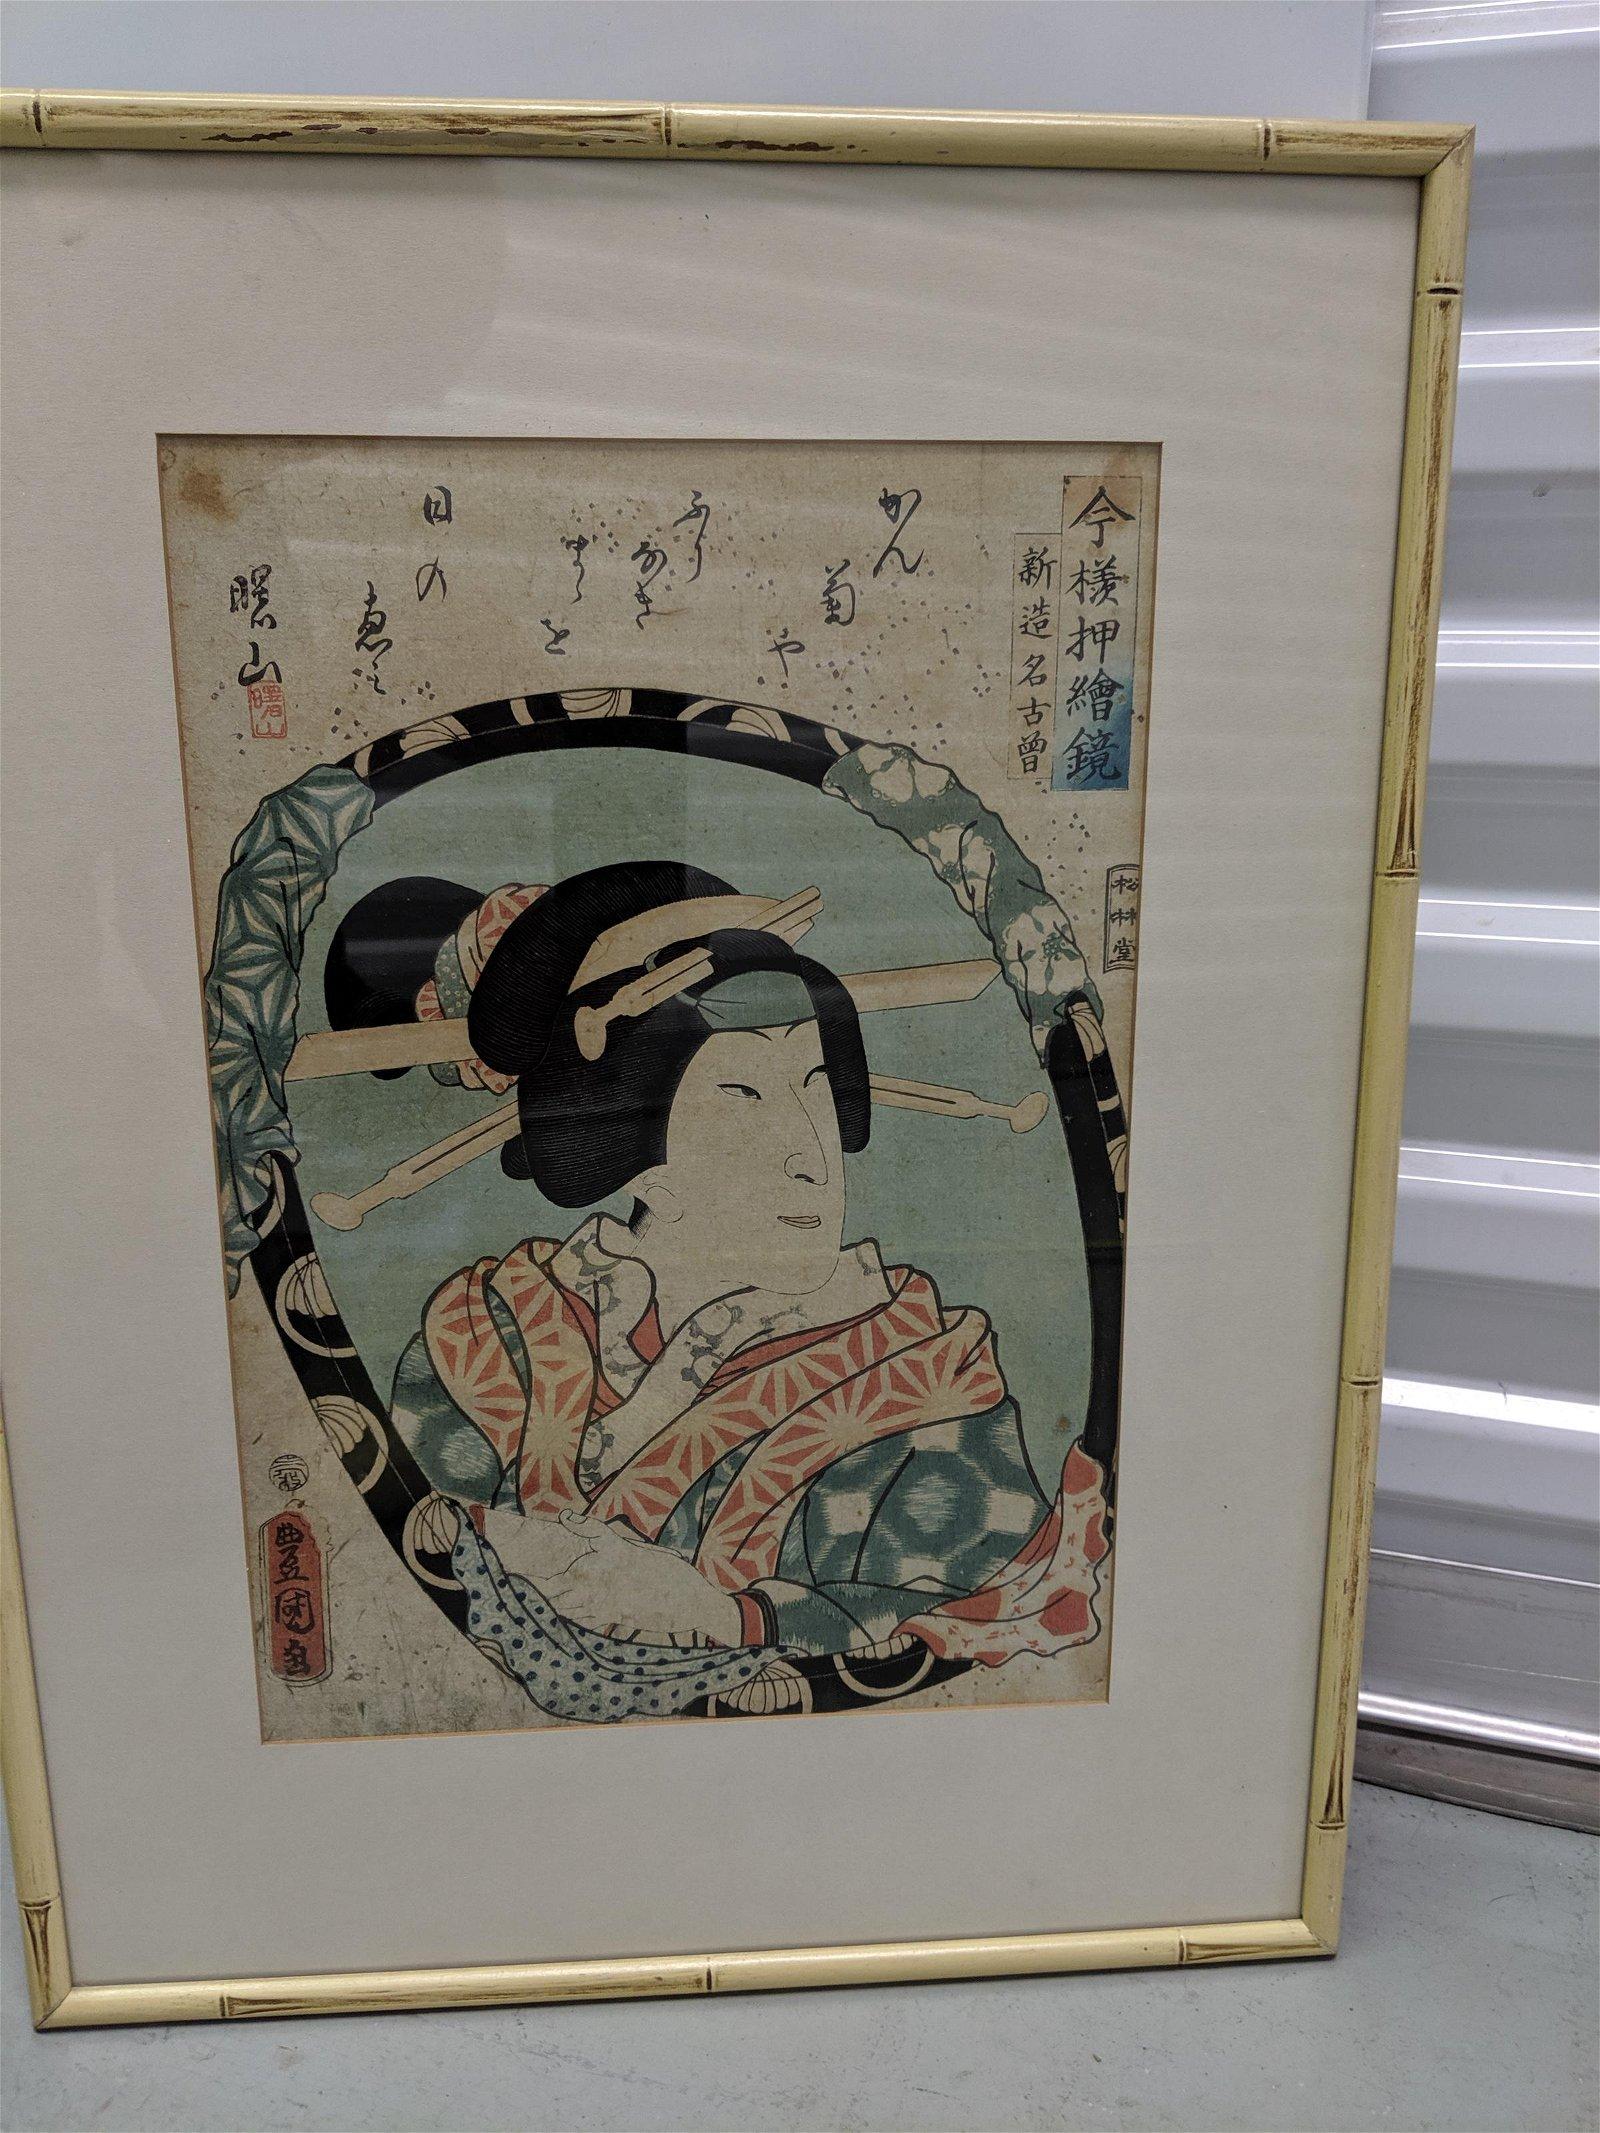 Antique Utagawa Kunisada Japanese Woodblock Print of